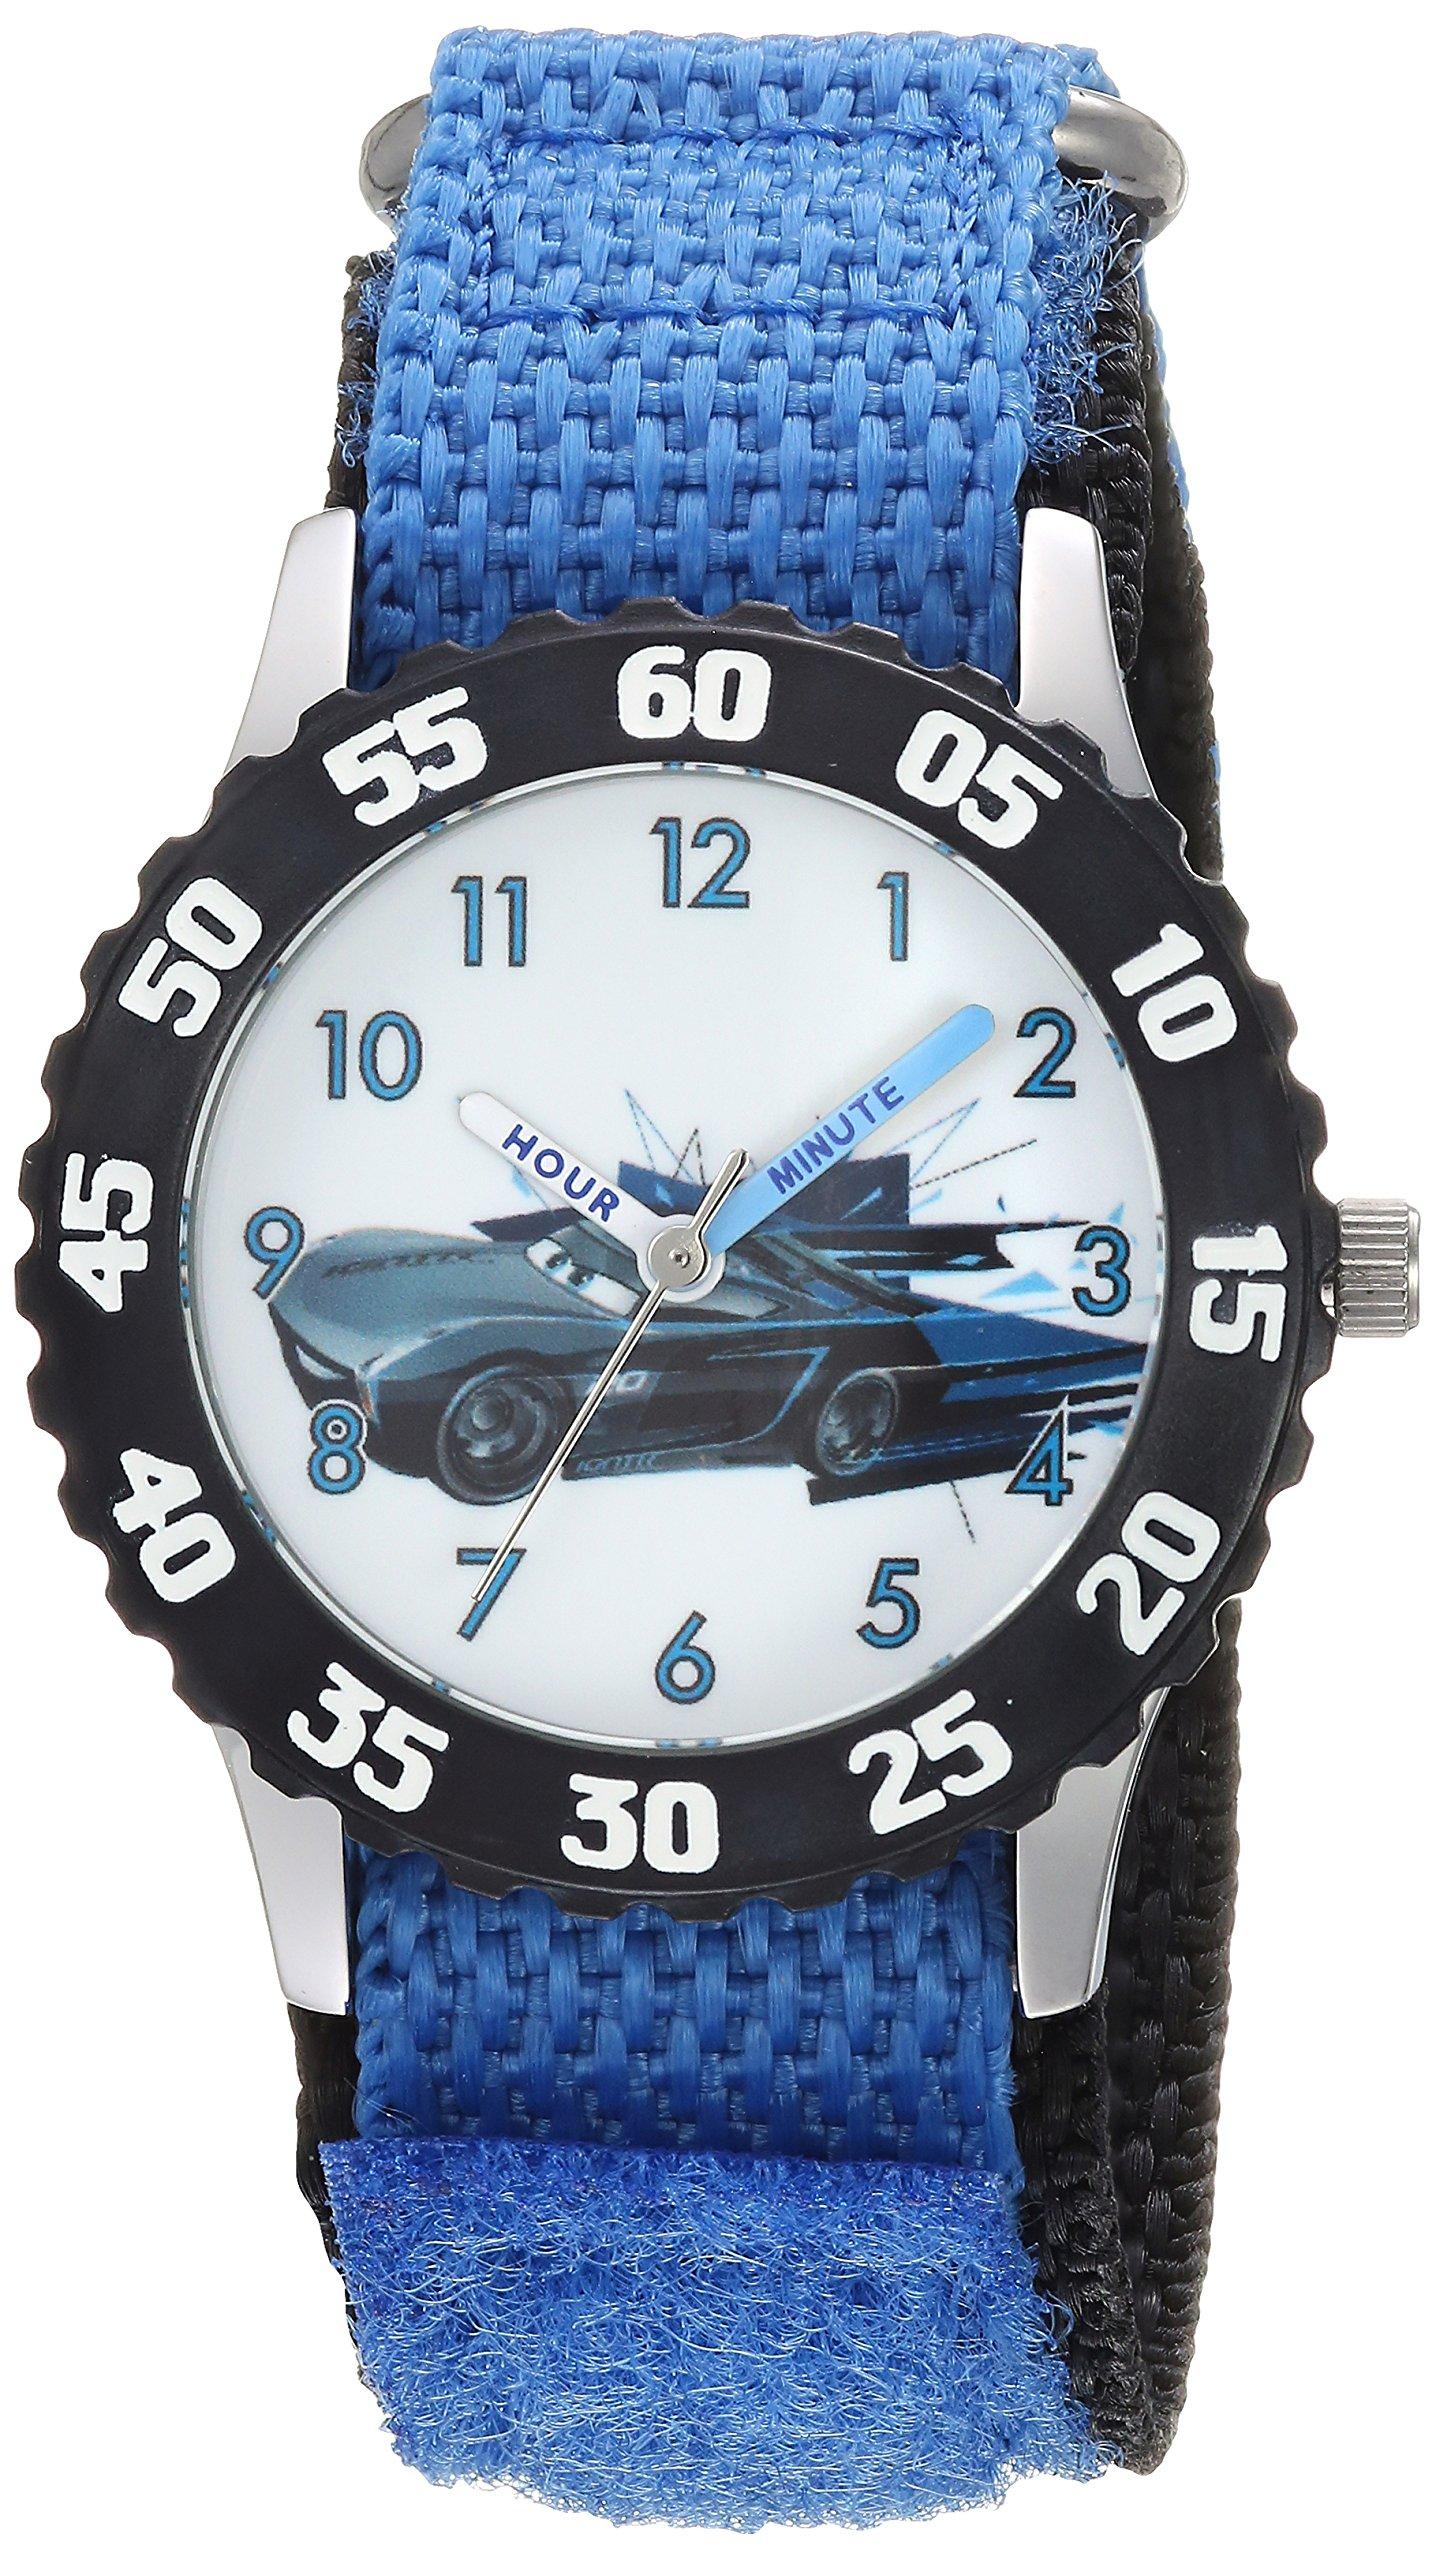 DISNEY Boys Cars 3 Stainless Steel Analog-Quartz Watch with Nylon Strap, Blue, 16 (Model: WDS000465)